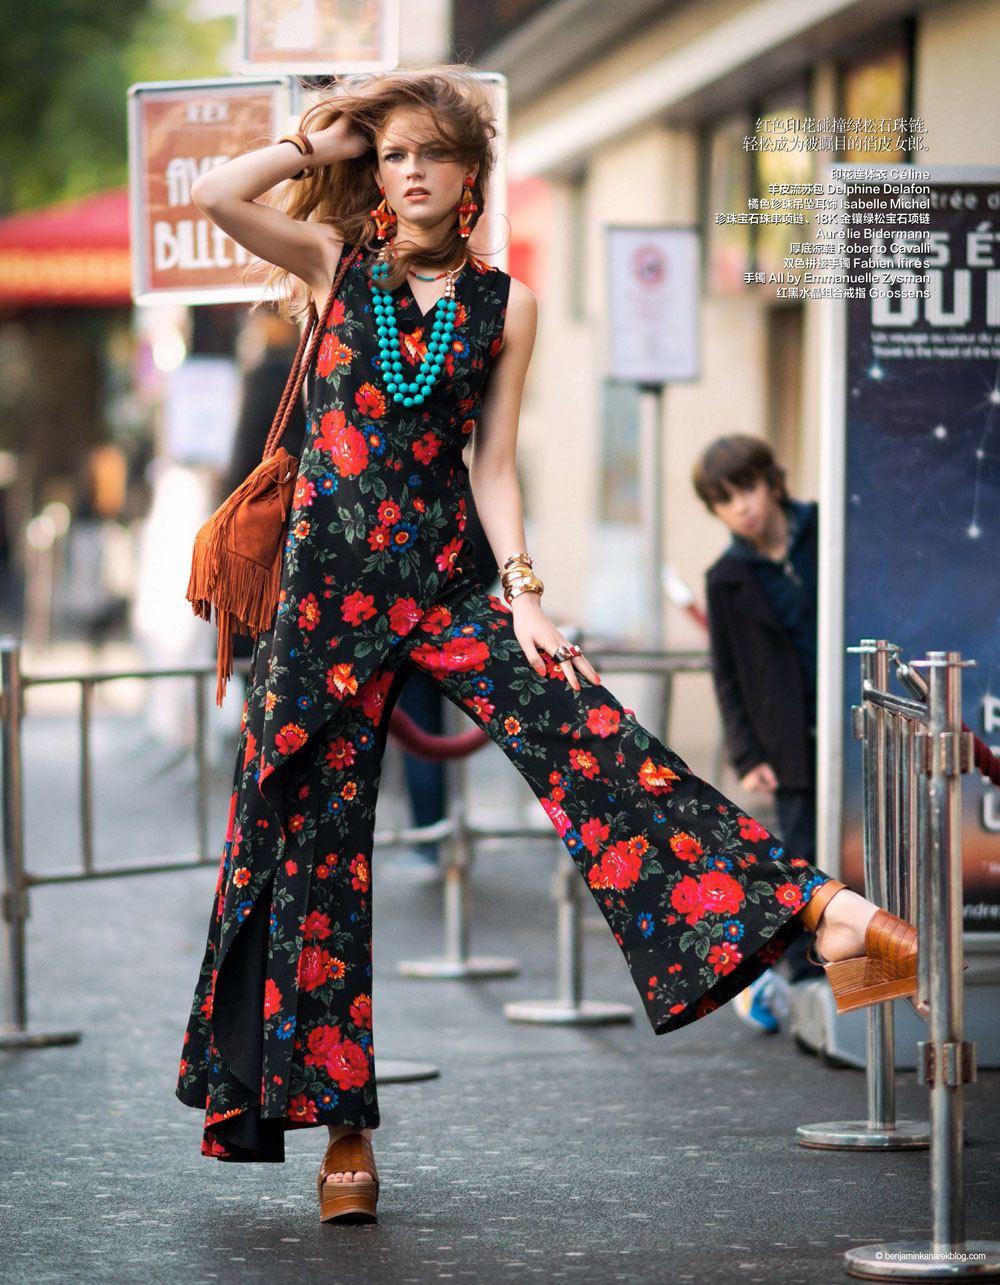 Steal The Look 70 39 S Hippie Glam In Harper S Bazaar Skimbaco Lifestyle Online Magazine